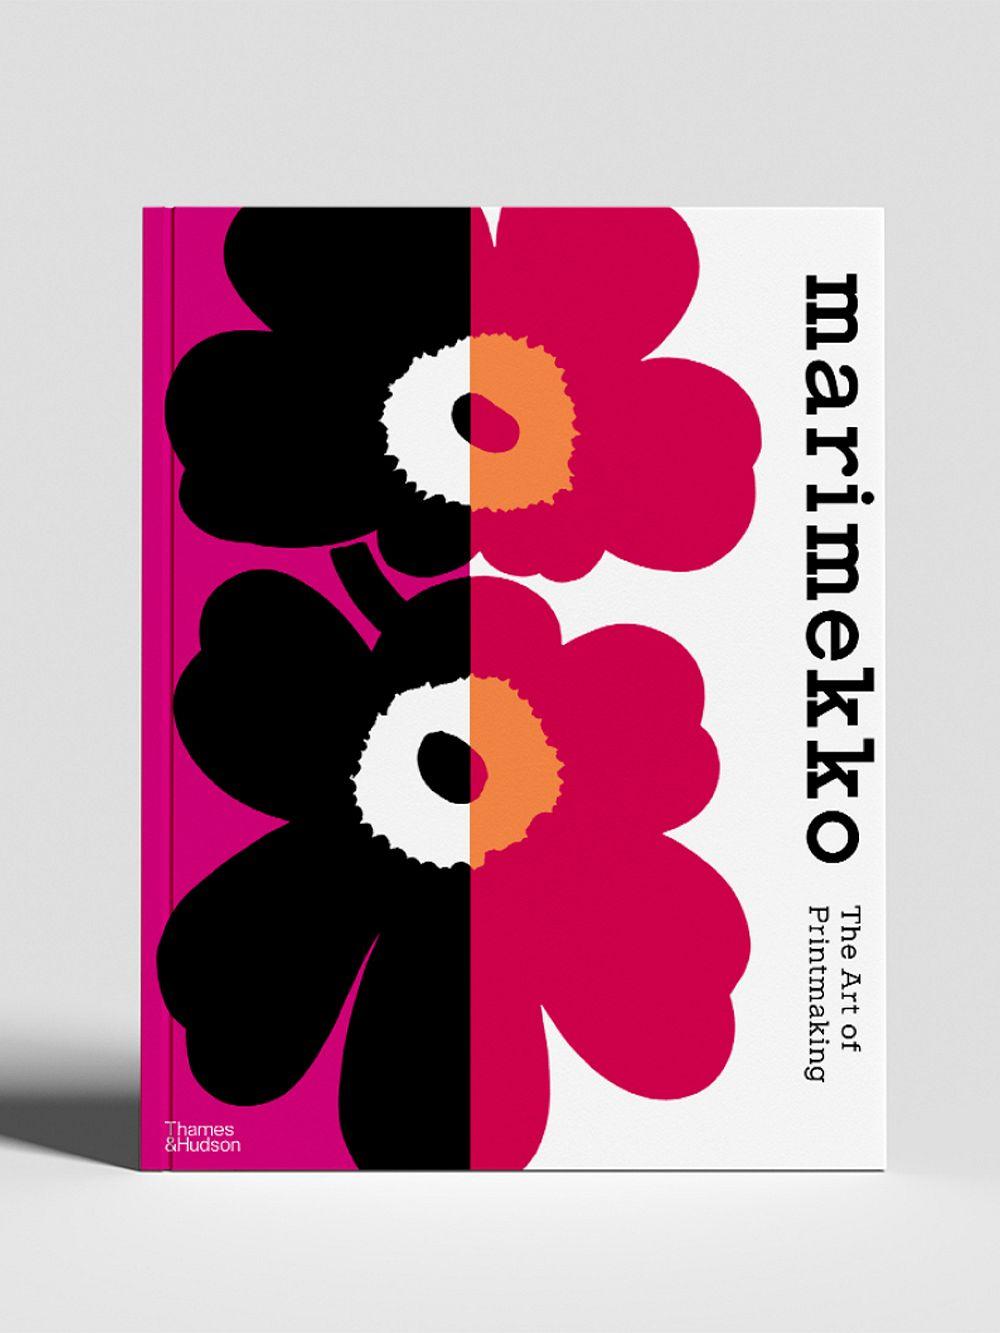 Marimekko: The Art of Printmaking